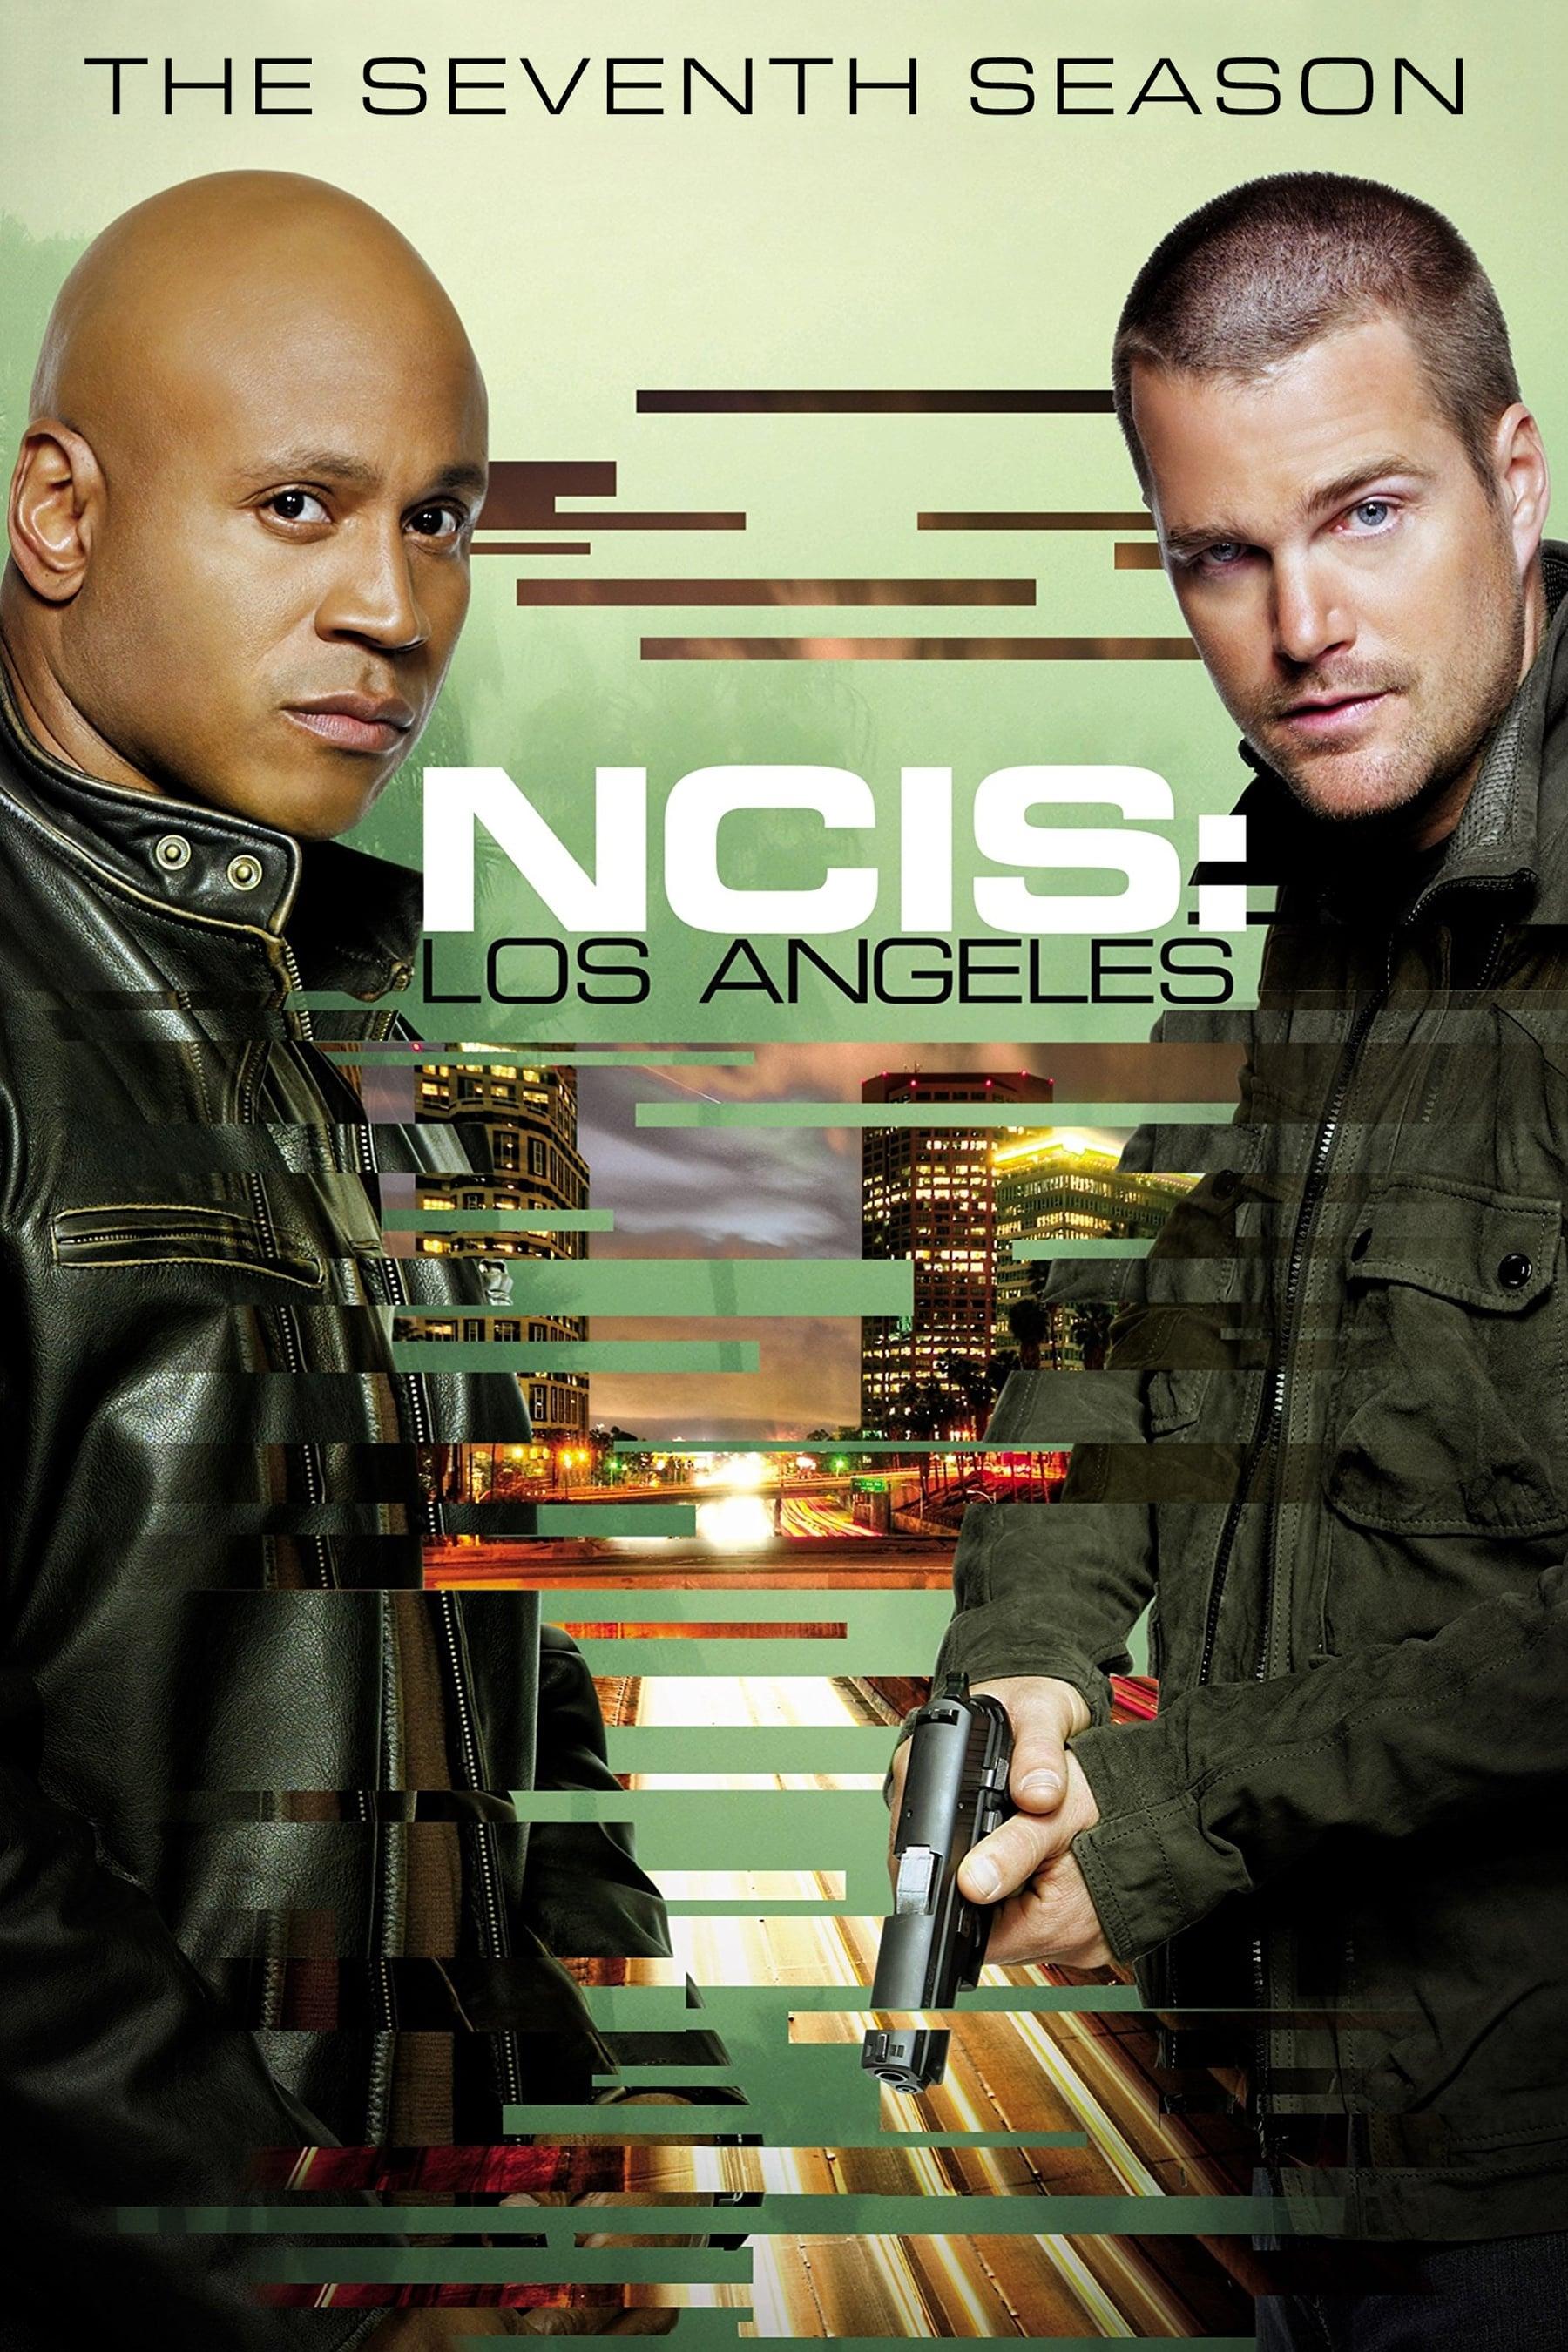 NCIS: Los Angeles Season 7